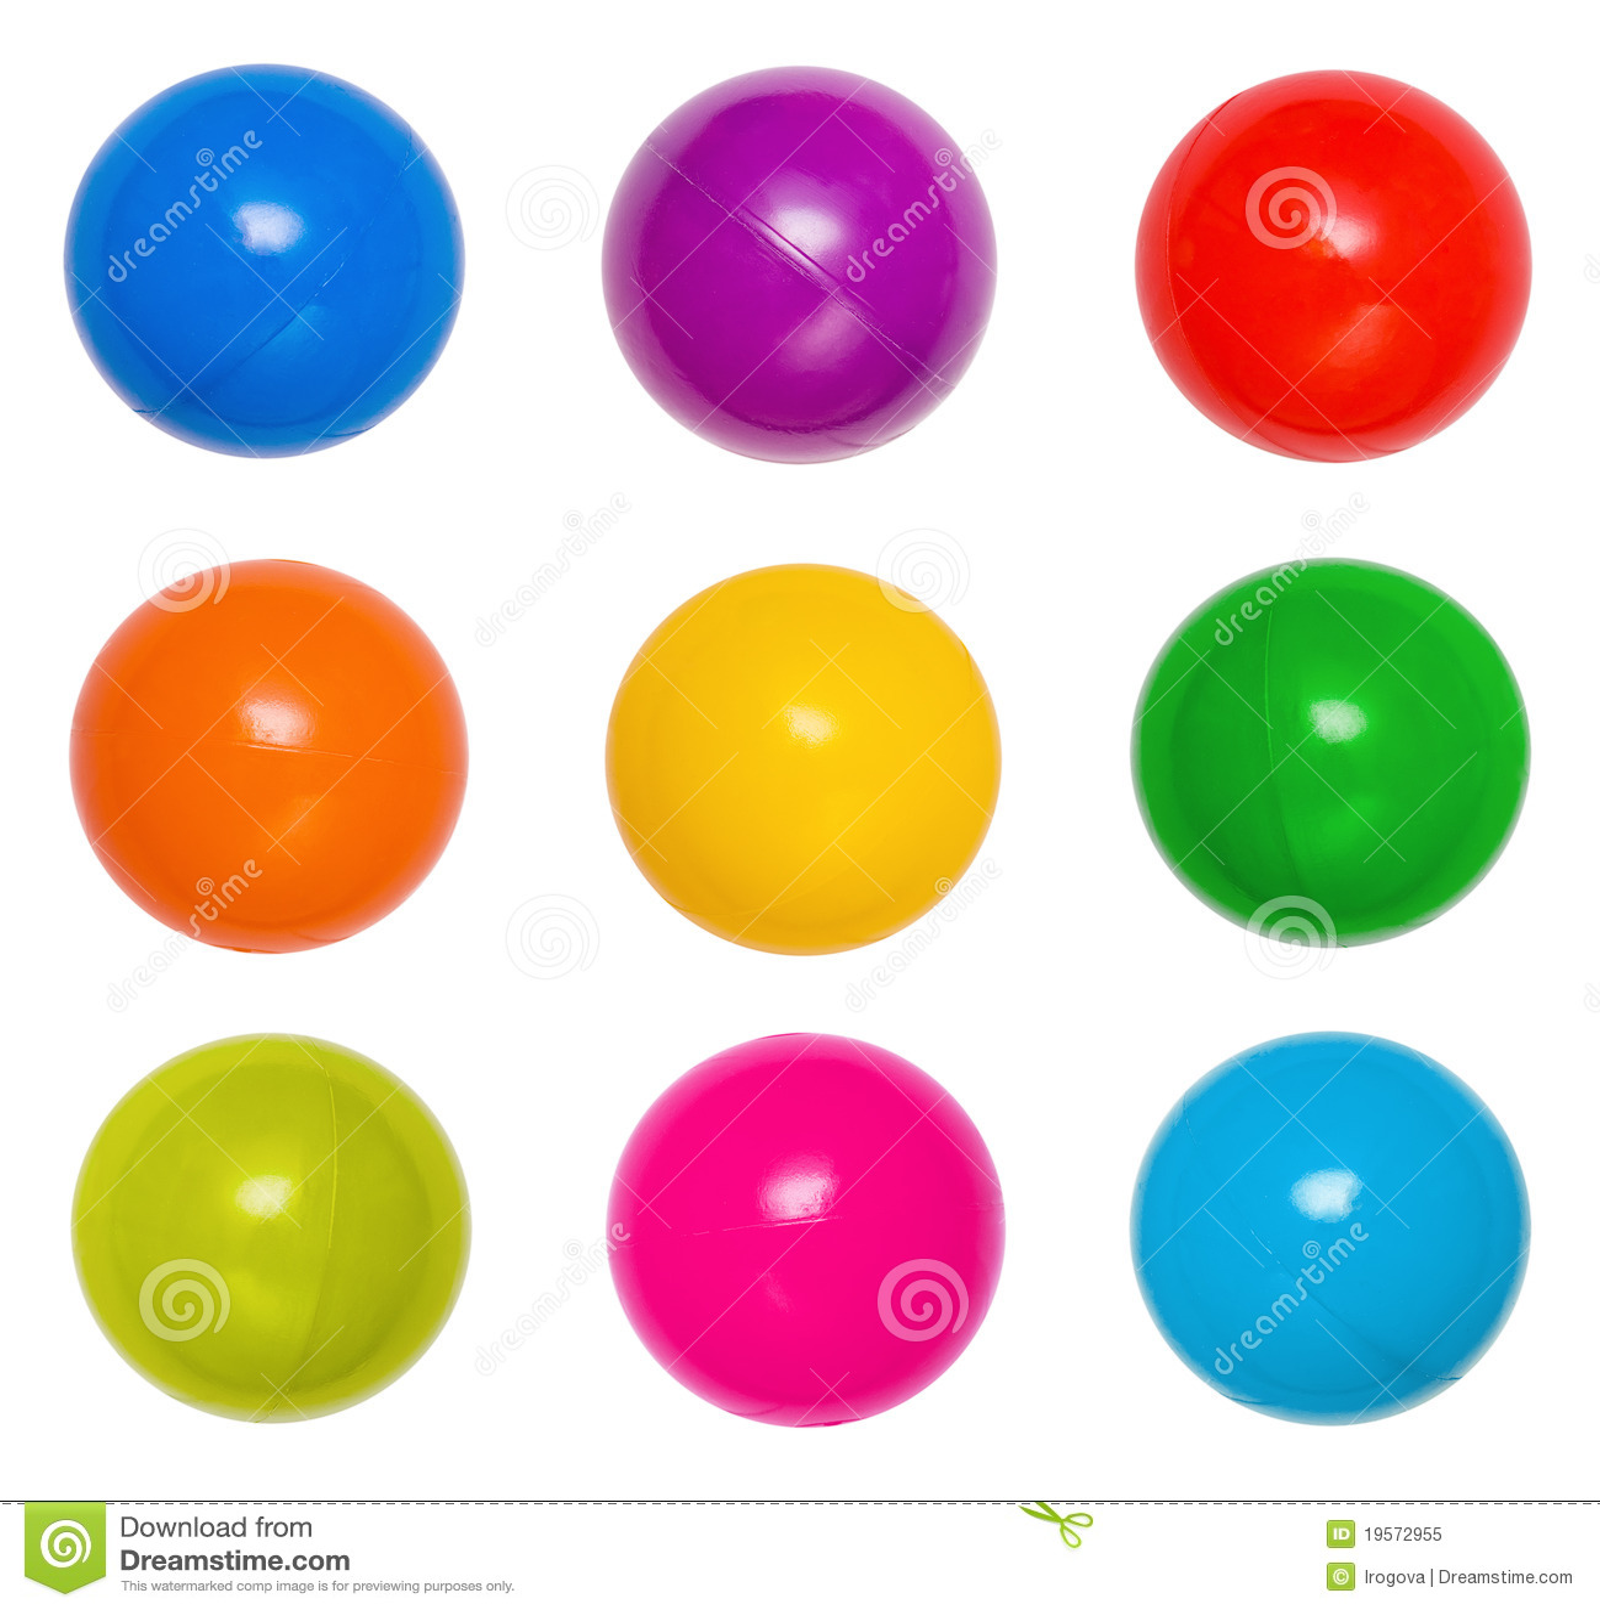 Many colour plastic balls